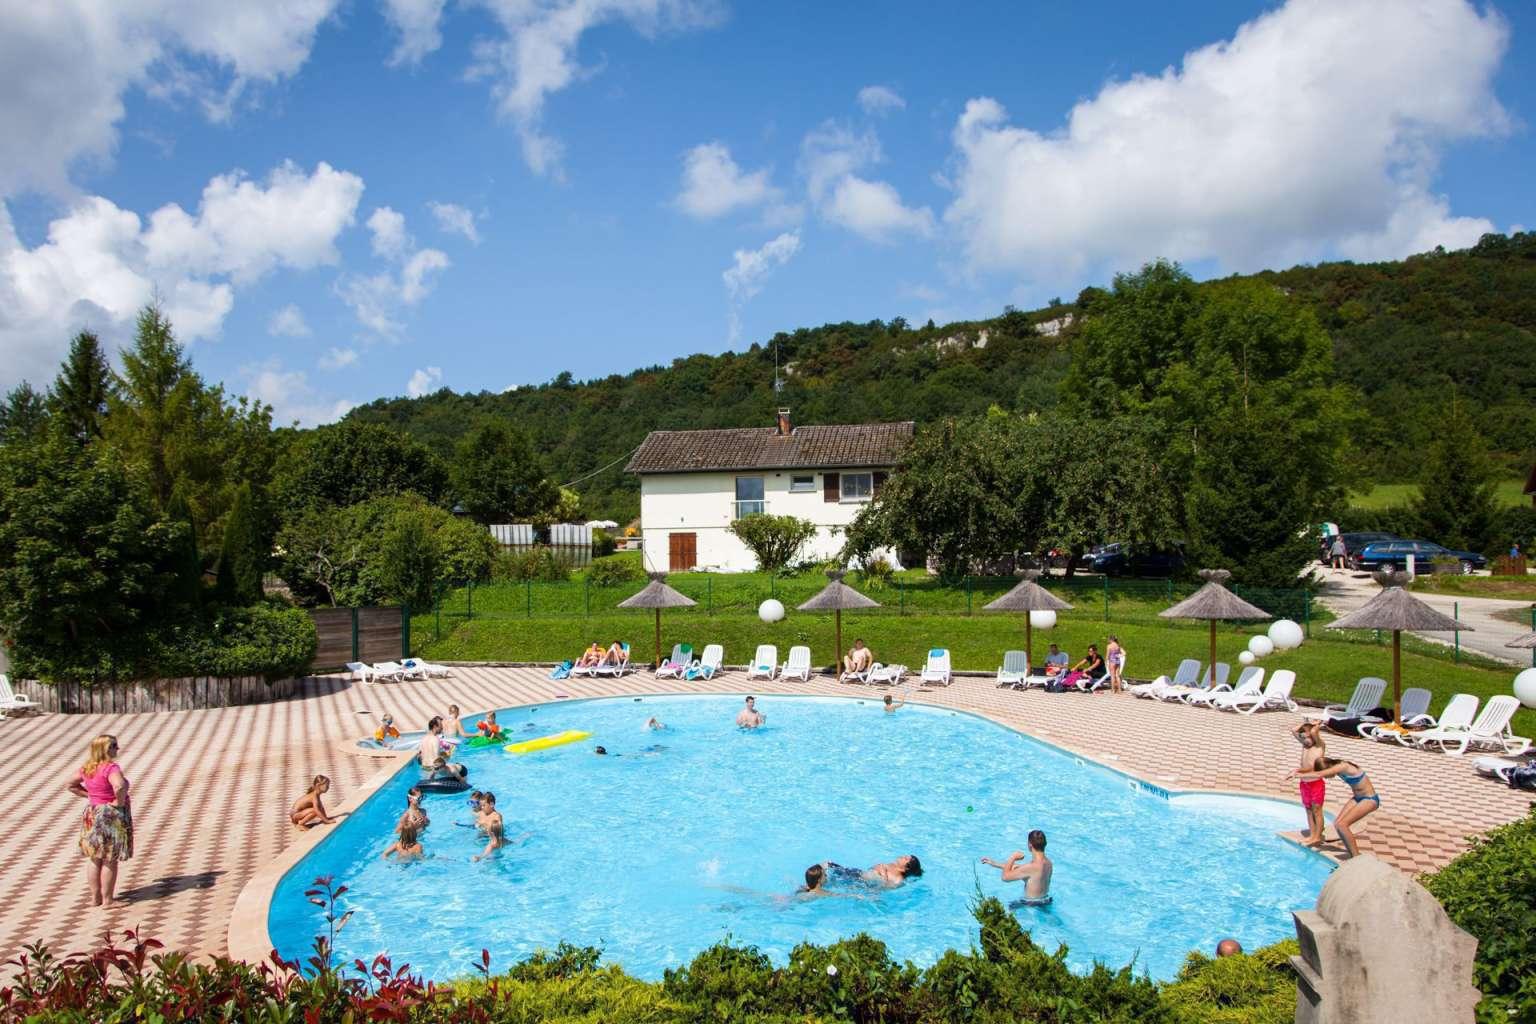 Schwimmbad Campingplatz Chatillon